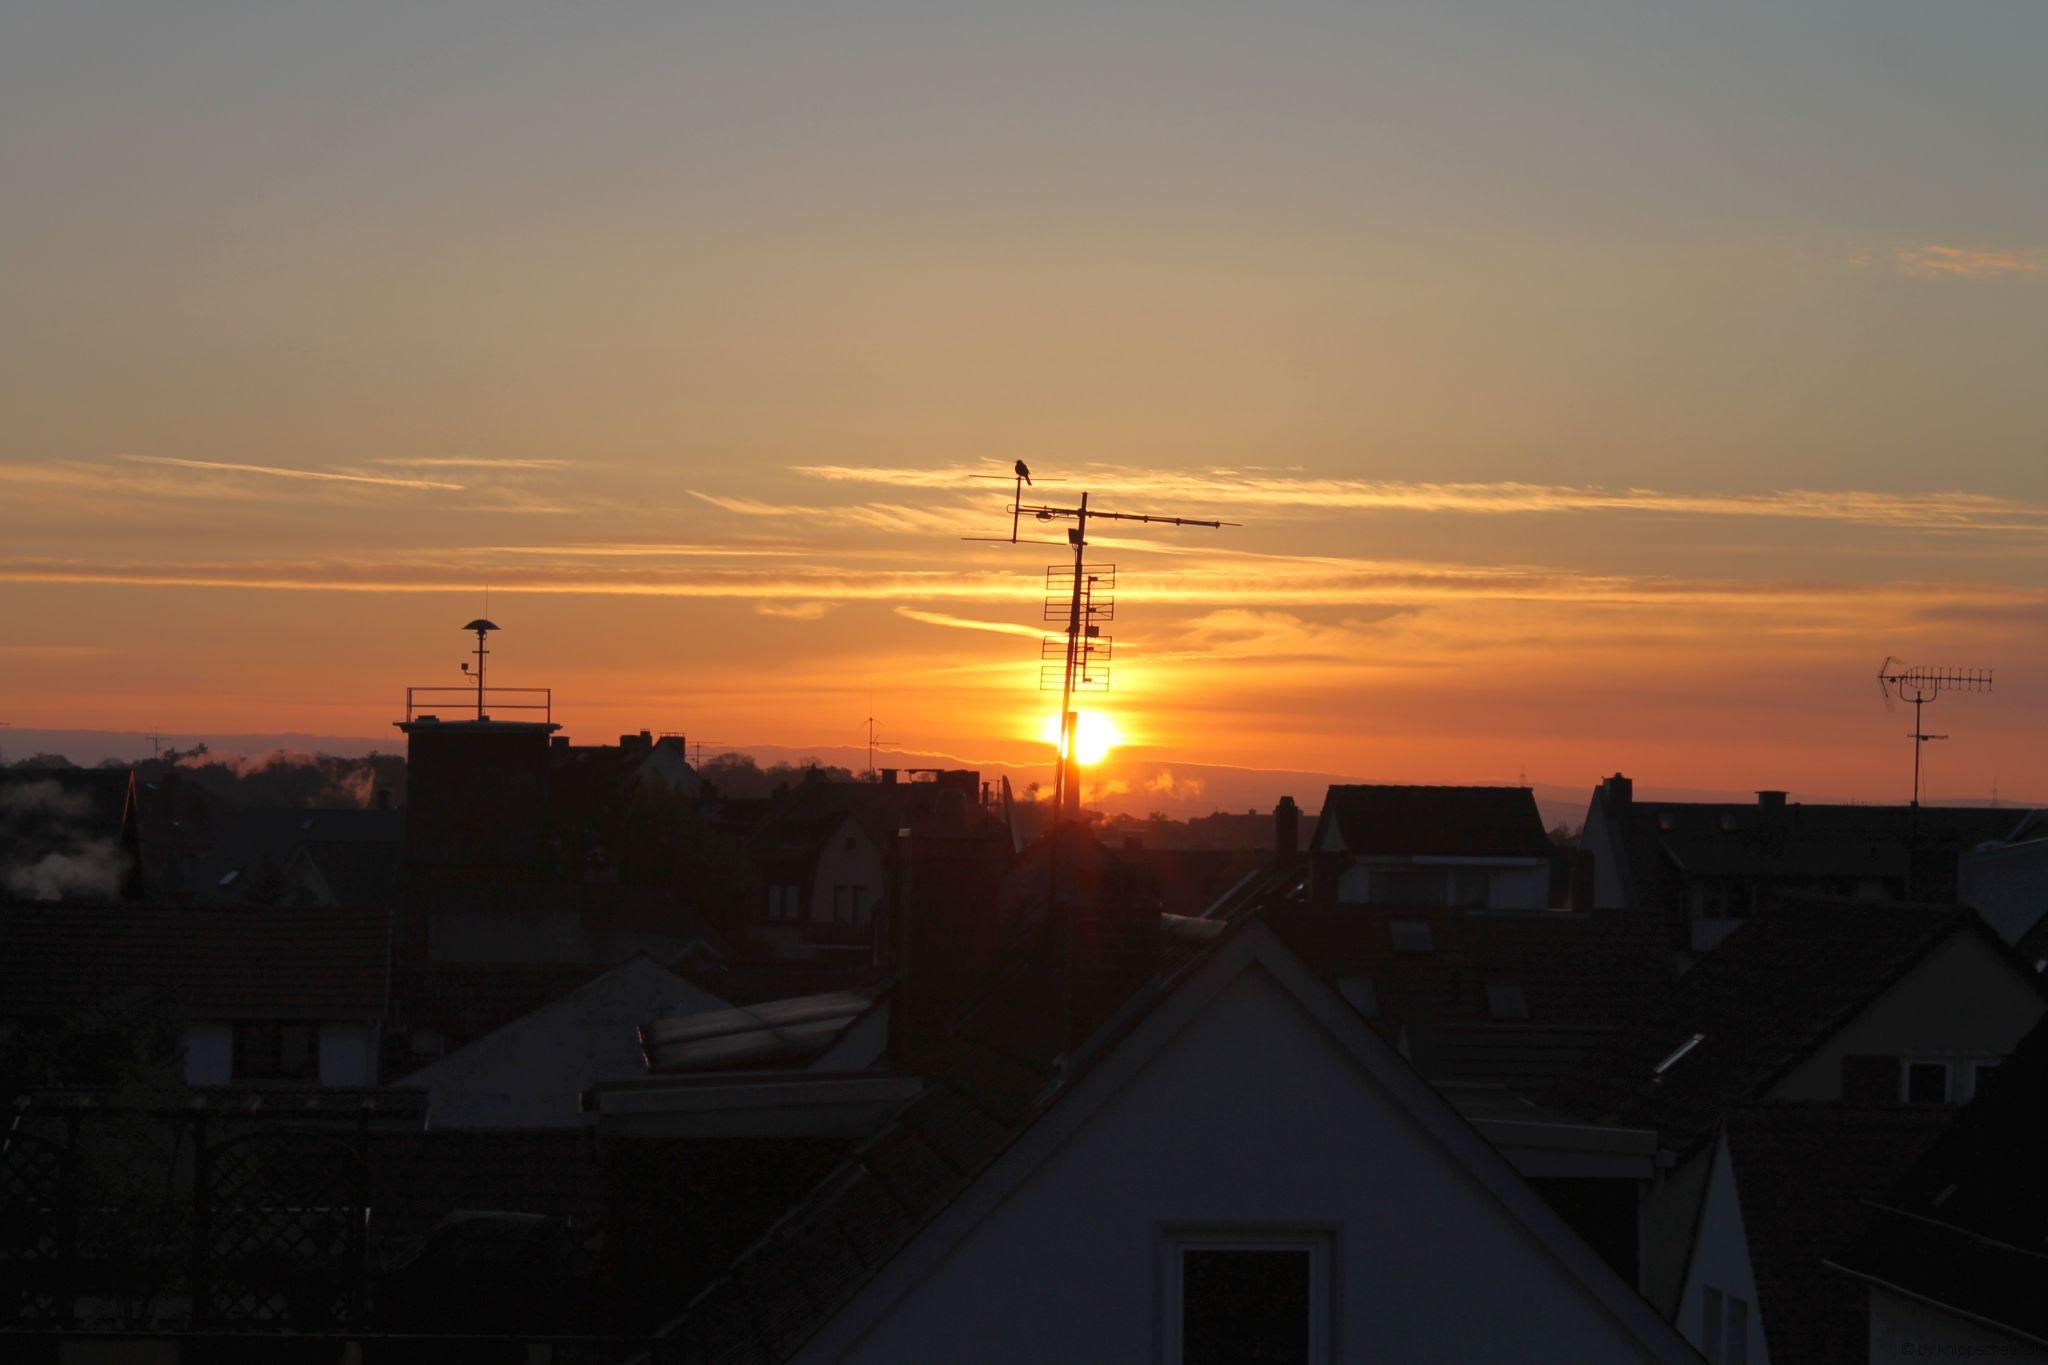 Sonnenaufgang @home